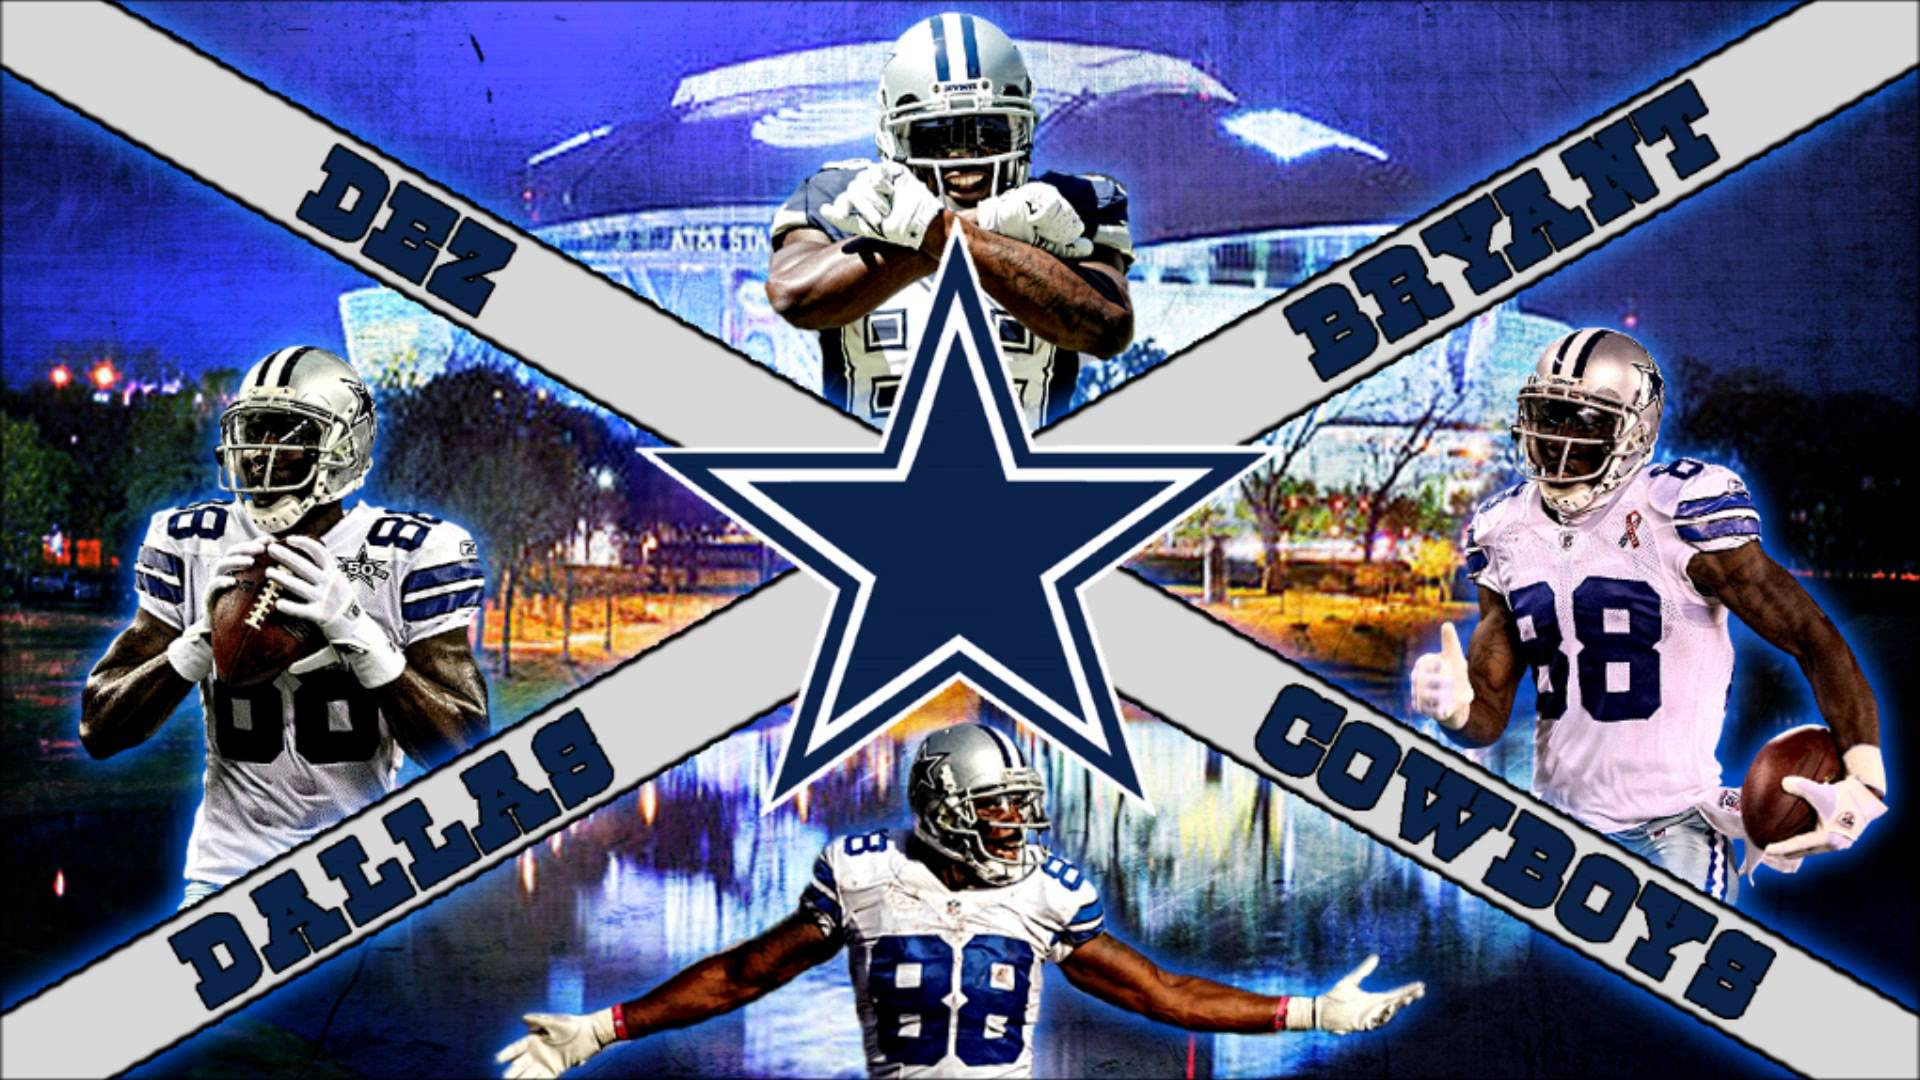 FREE NFL Dez Bryant Wallpaper - YouTube